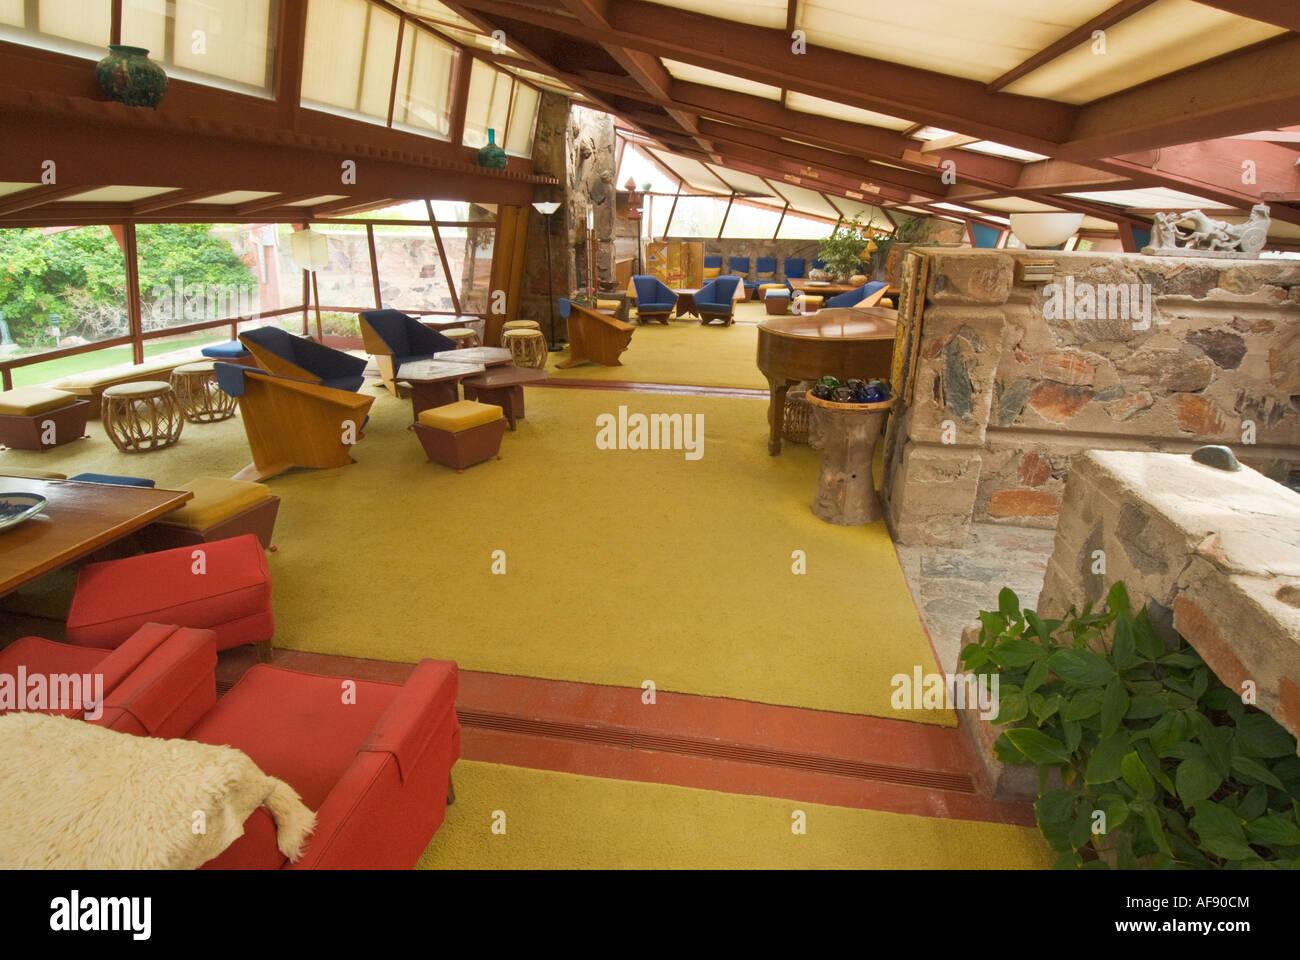 Arizona scottsdale taliesin west architect frank lloyd wright winter home and studio living room stock